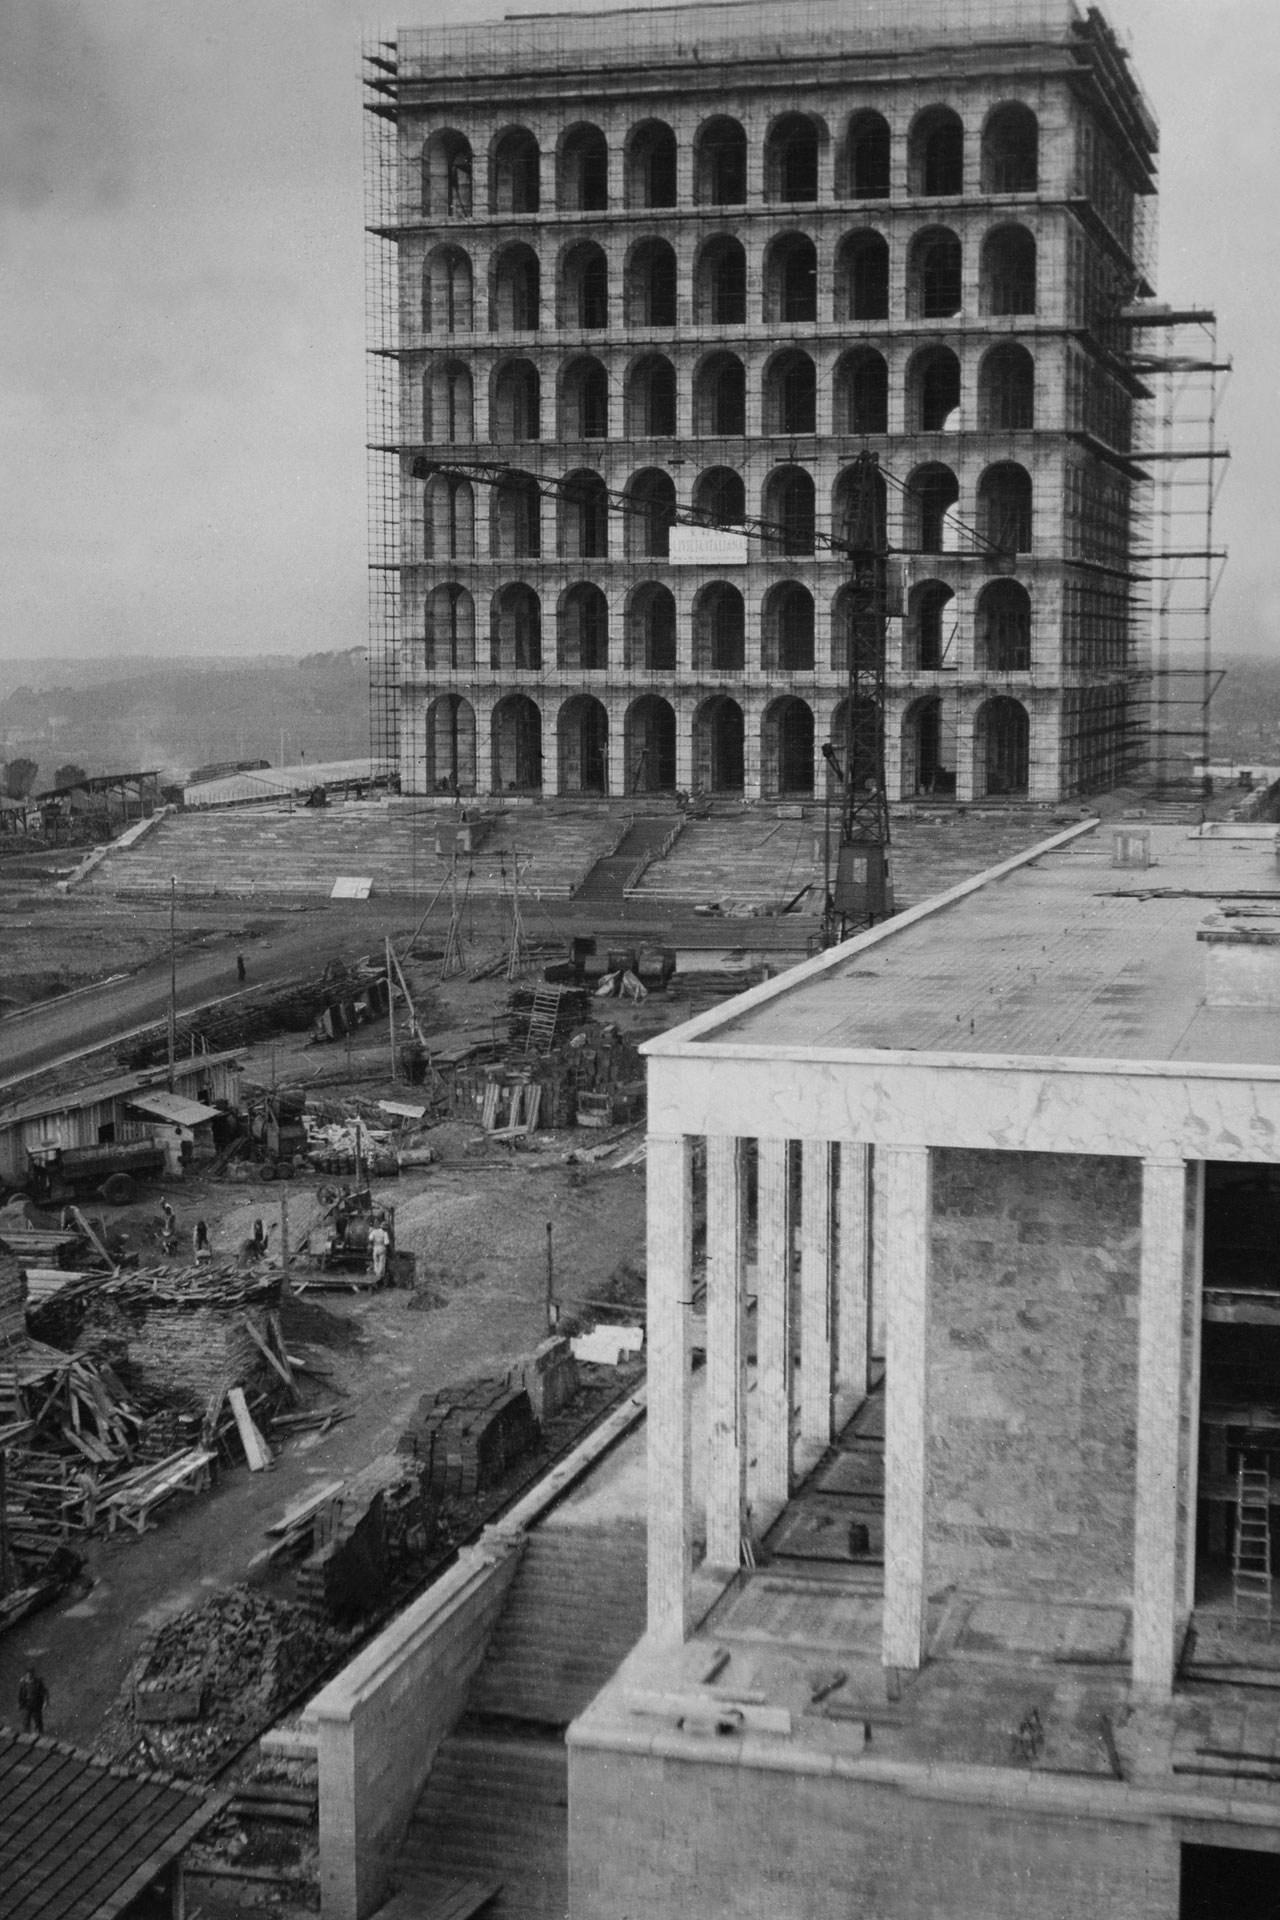 Galeria de palazzo della civilt italiana em roma for Palazzo della civilta italiana fendi